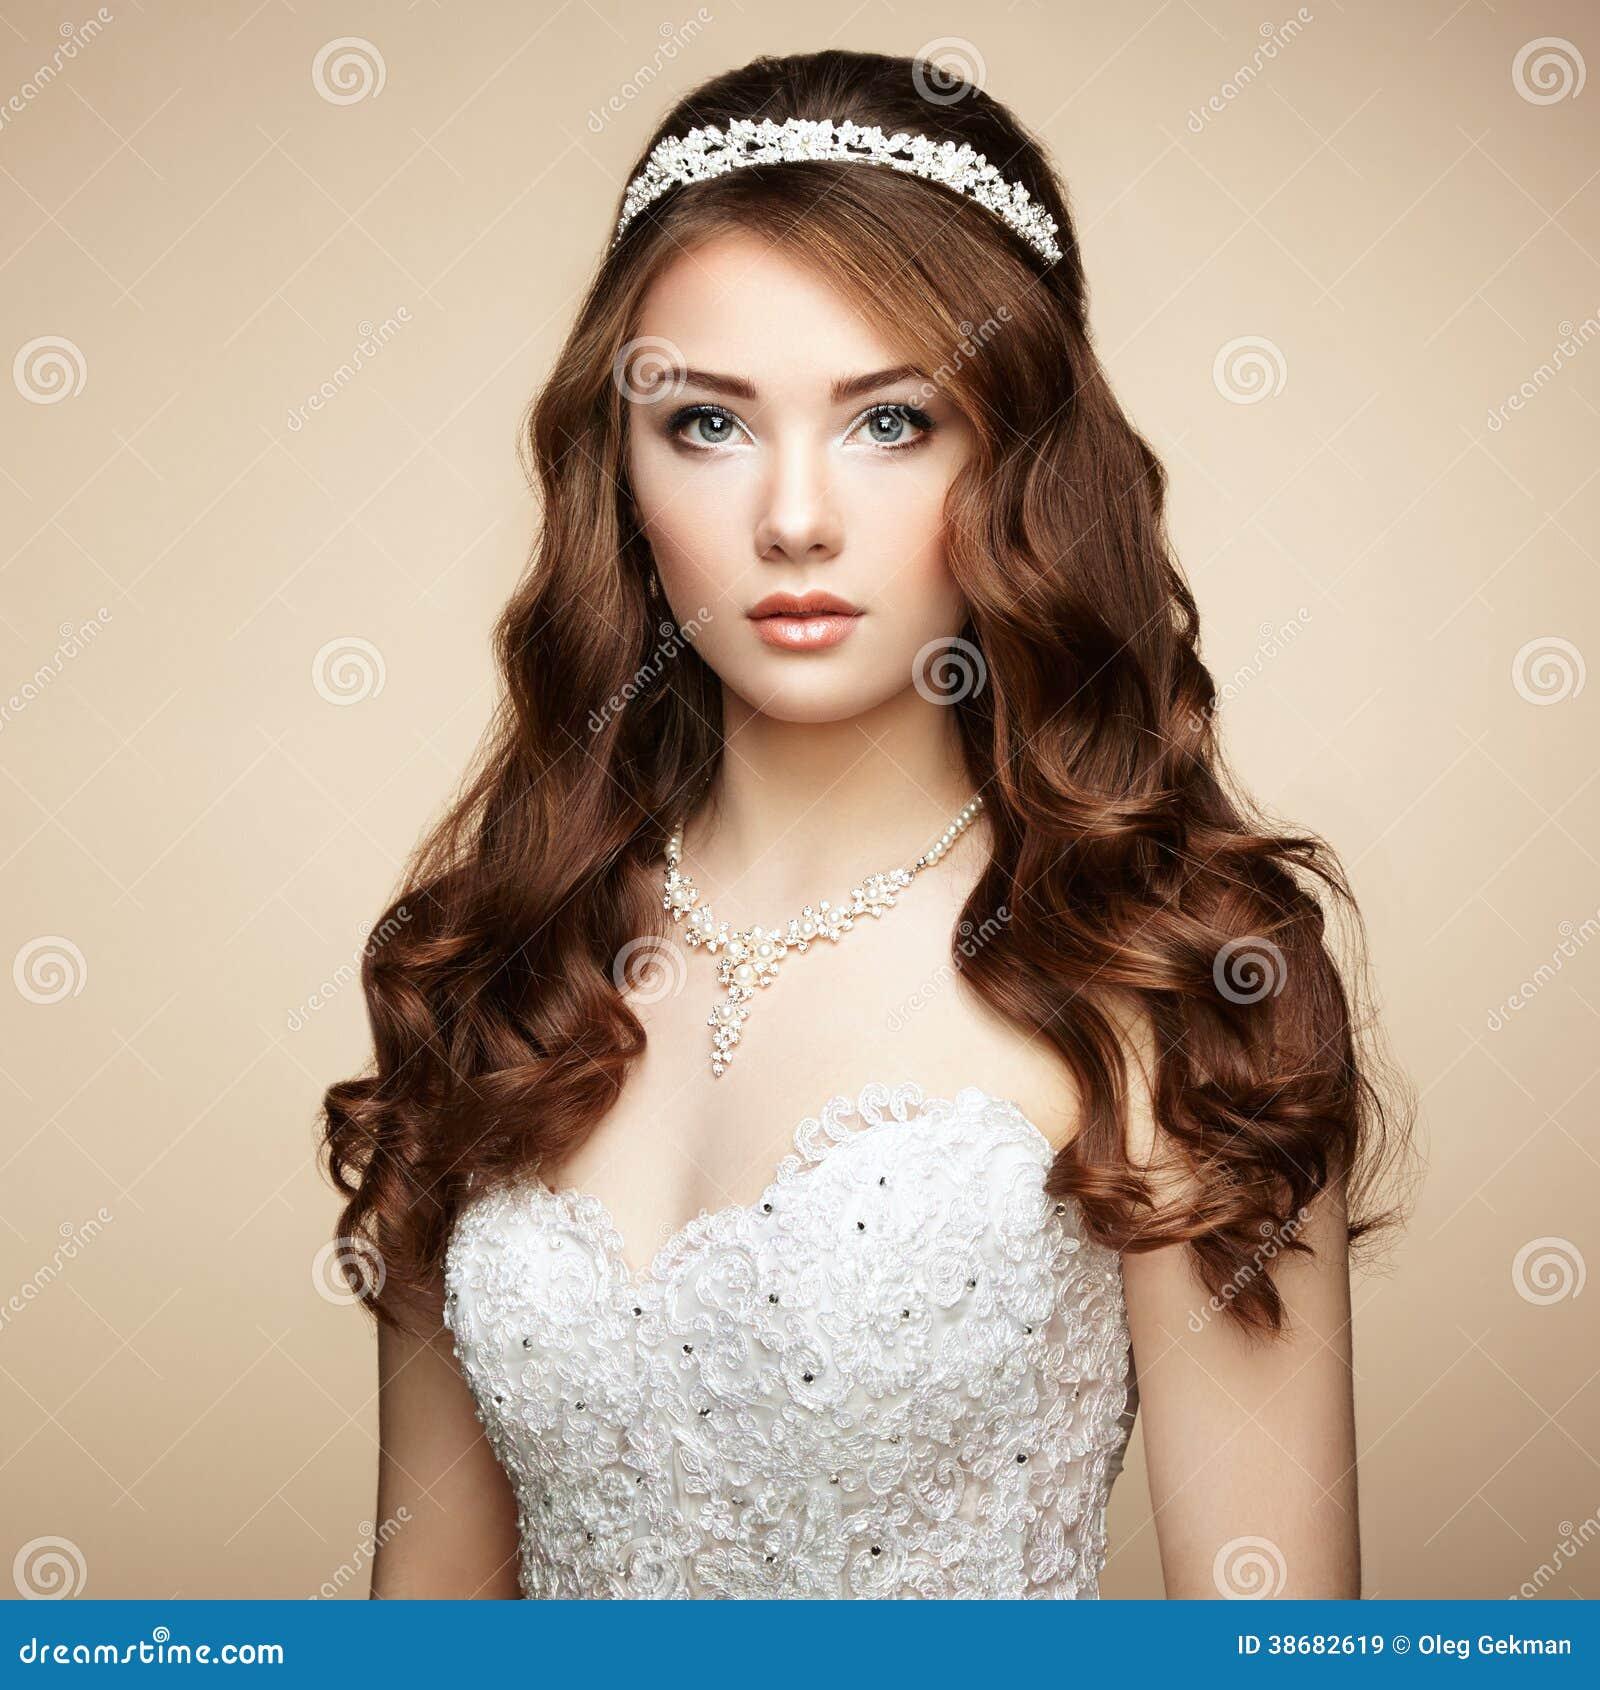 Classy And Glamorous Photo: Portrait Of Beautiful Sensual Woman Royalty Free Stock